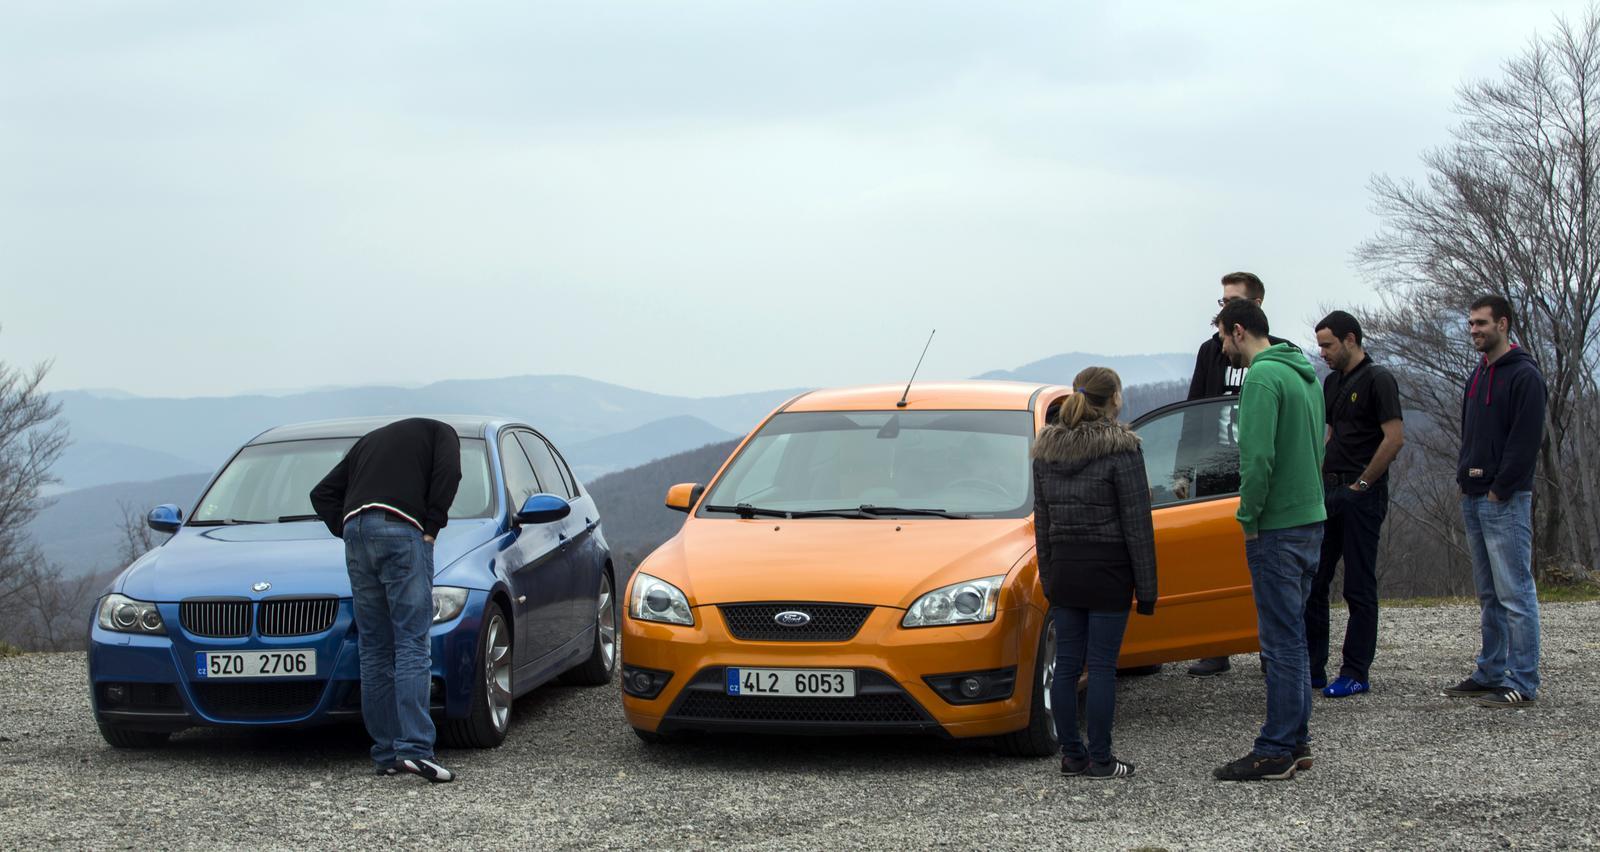 BMW 330i a Ford Focus ST a skupinka debatujících lidí